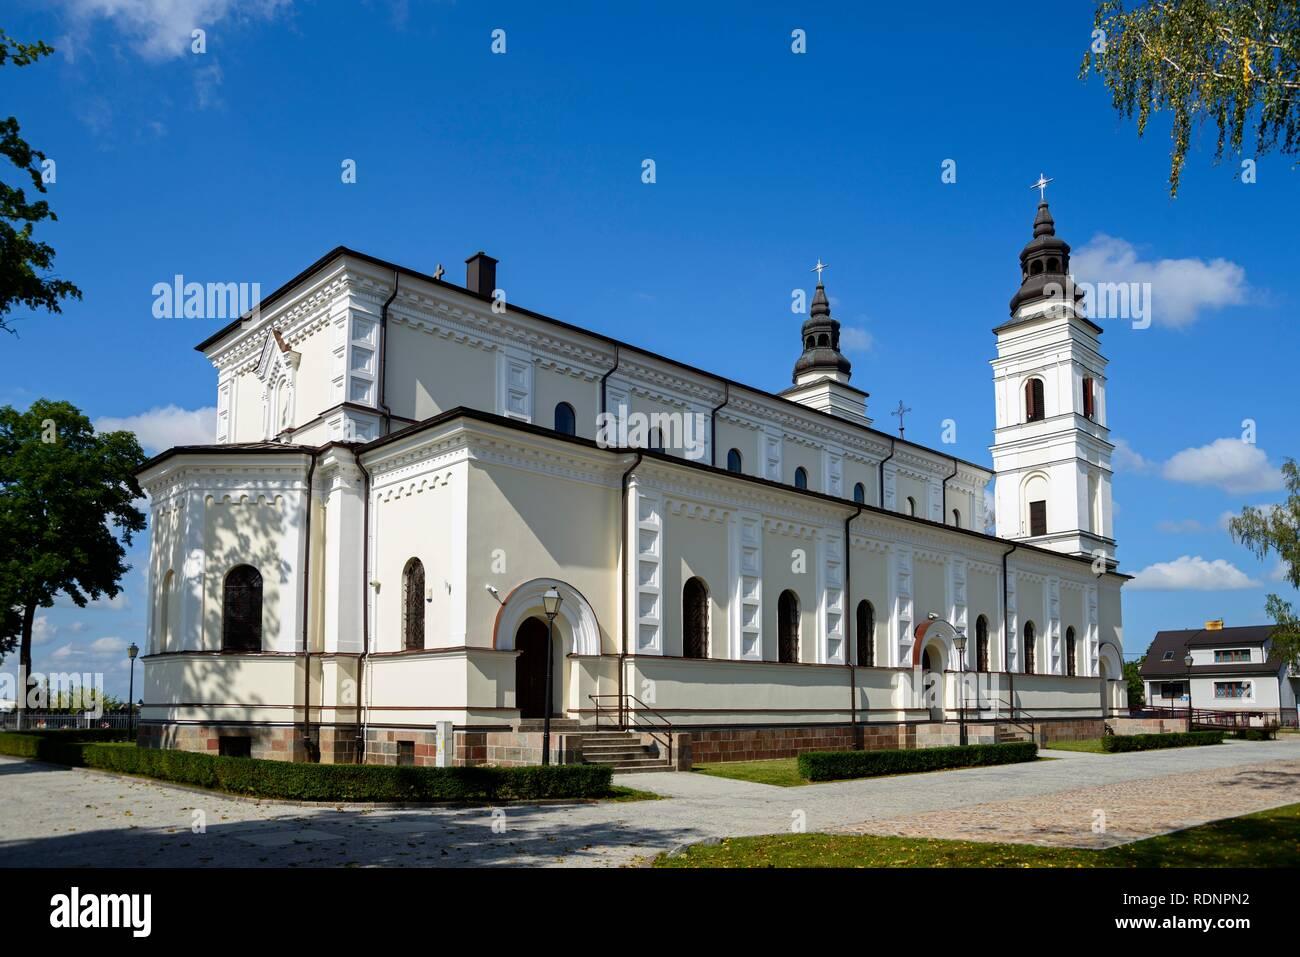 Church, Suwalki, Podlaskie, Poland - Stock Image